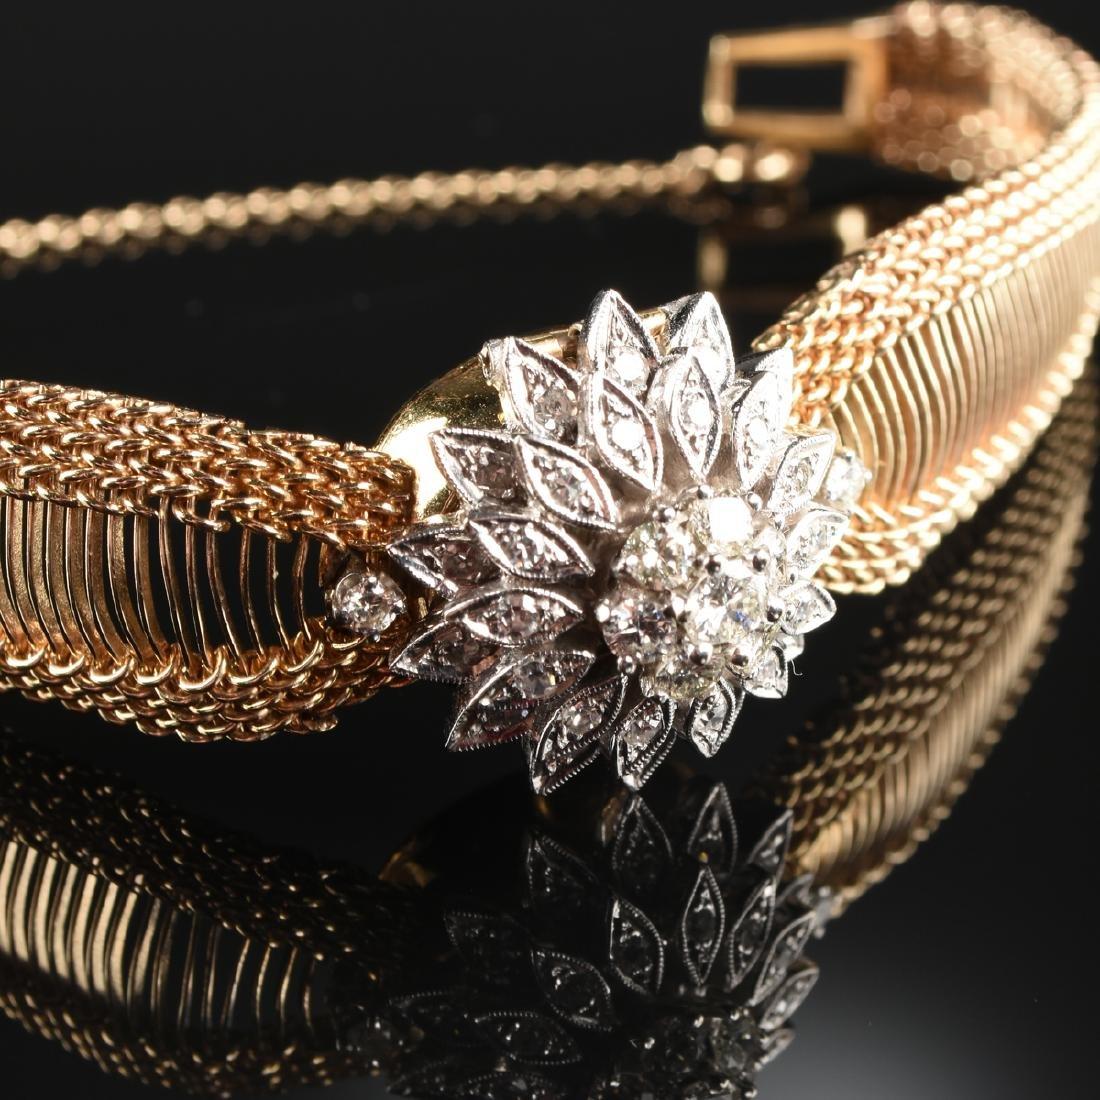 A 14K TWO TONE GOLD AND DIAMOND HAMILTON LADY'S - 2